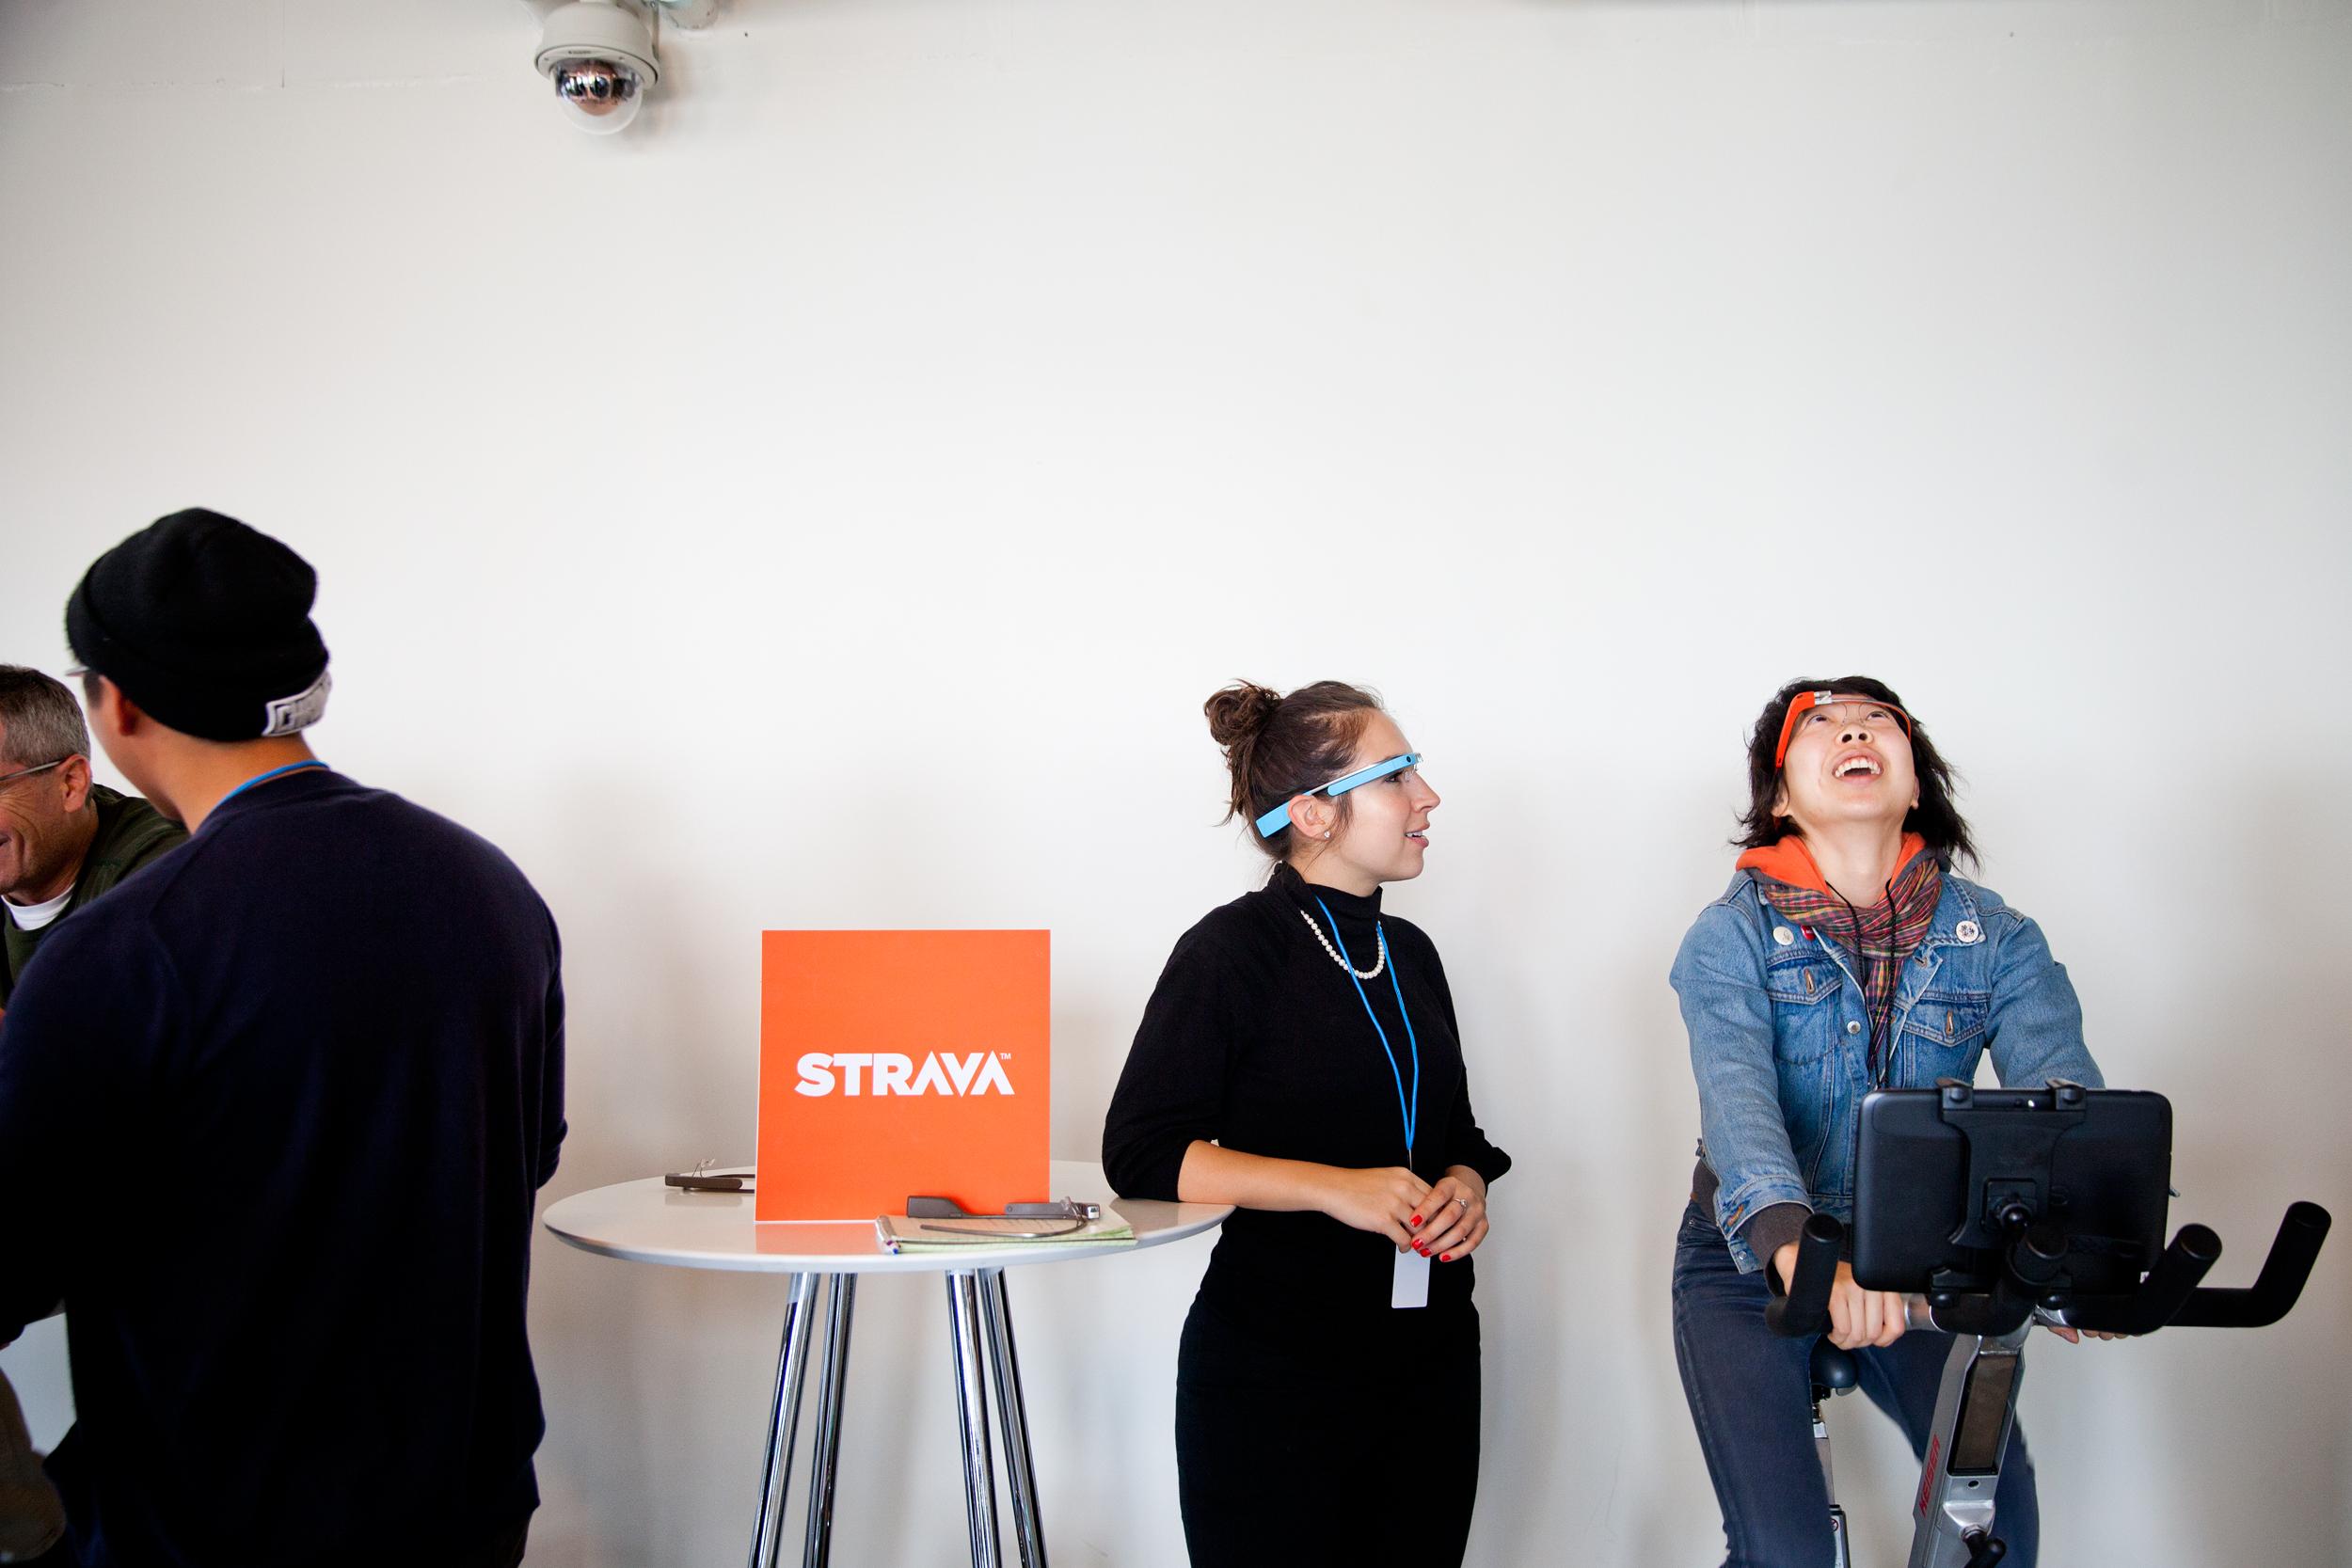 Google Glass GDK announcement event in San Francisco. Photo: Ariel Zambelich/WIRED